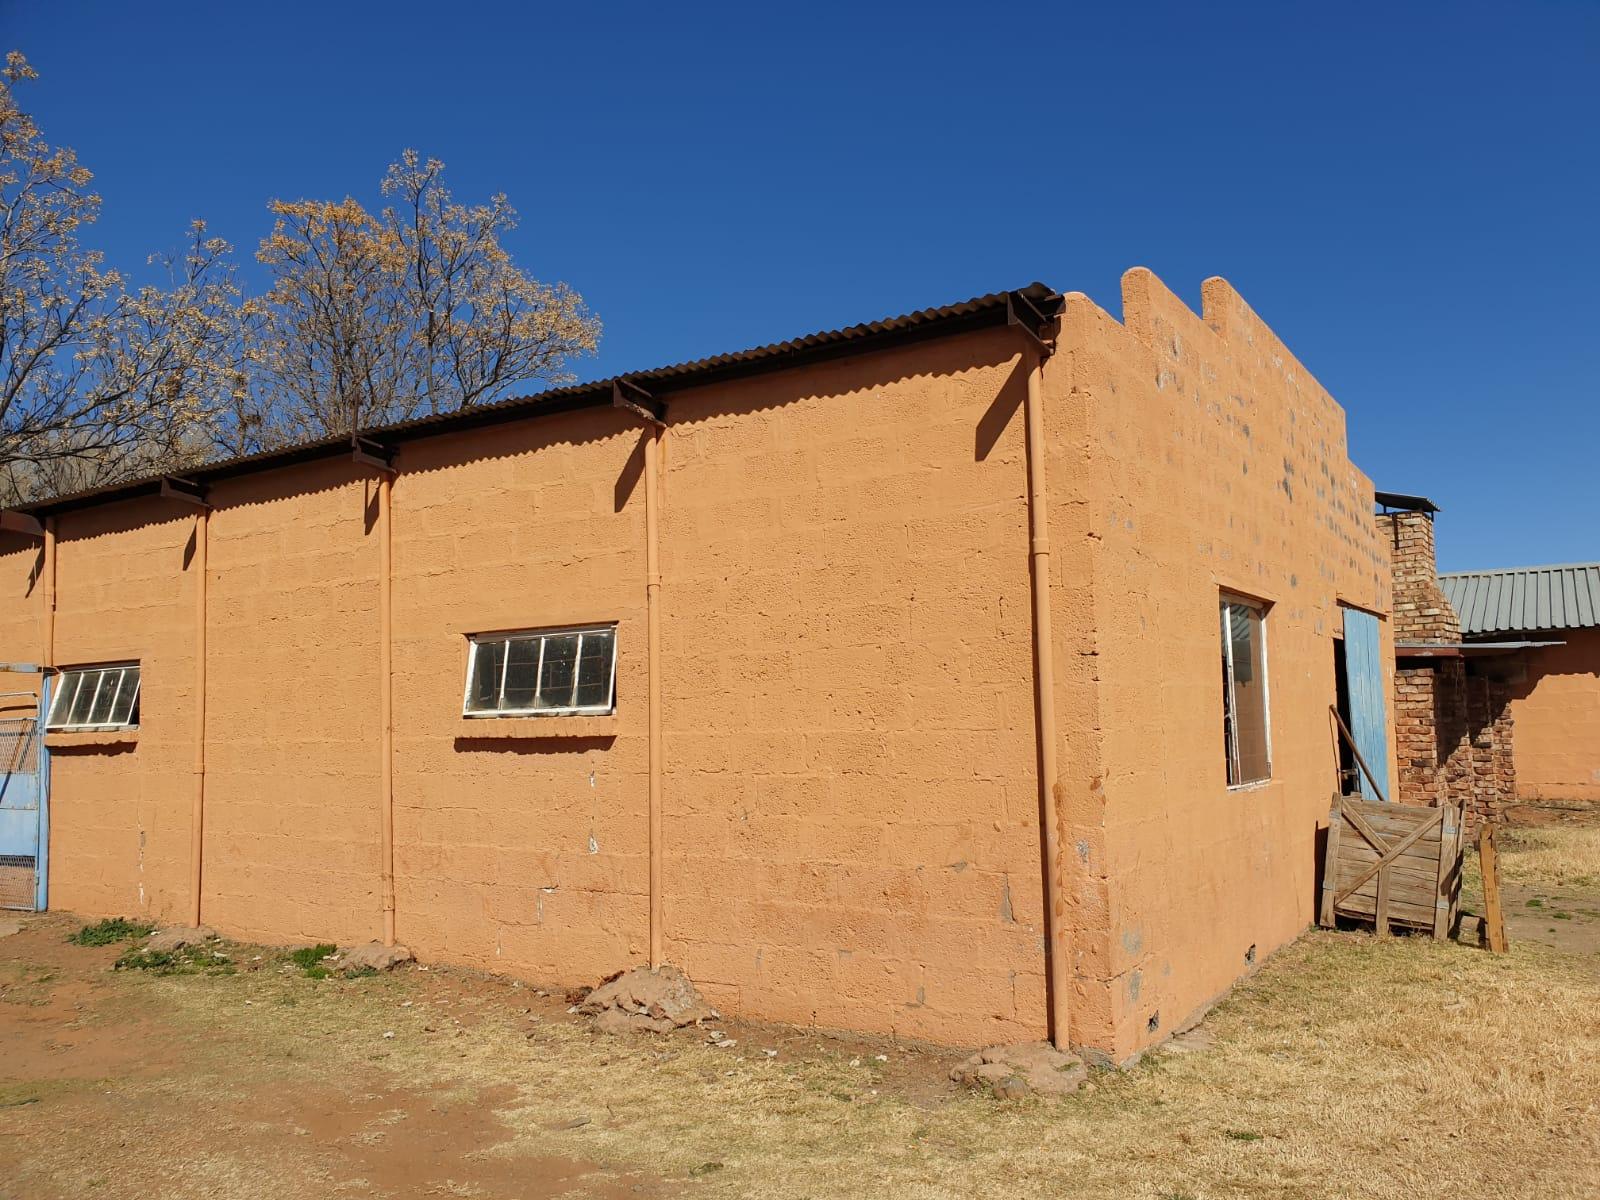 Nico Smith Afslaers Bloemfontein | NSA Auctioneers Bloemfontein